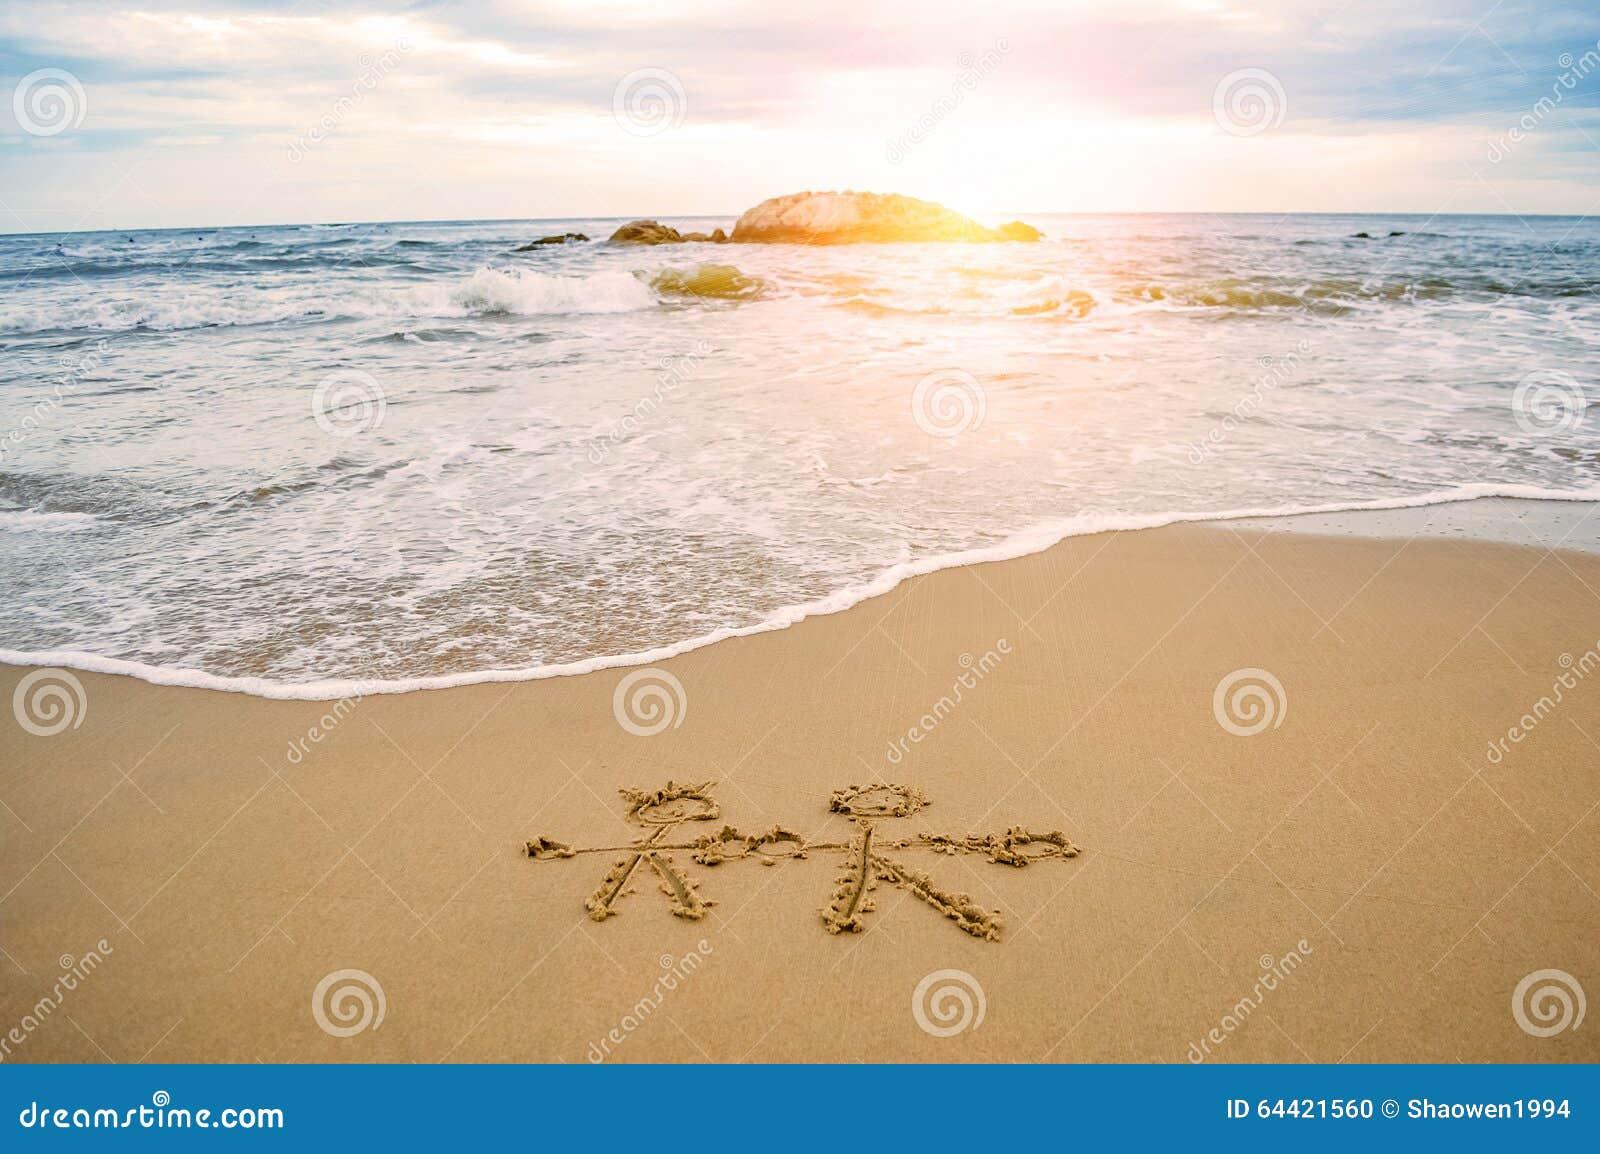 Couple Stick Figure On Beach Valentine Day Stock Photo Image Of